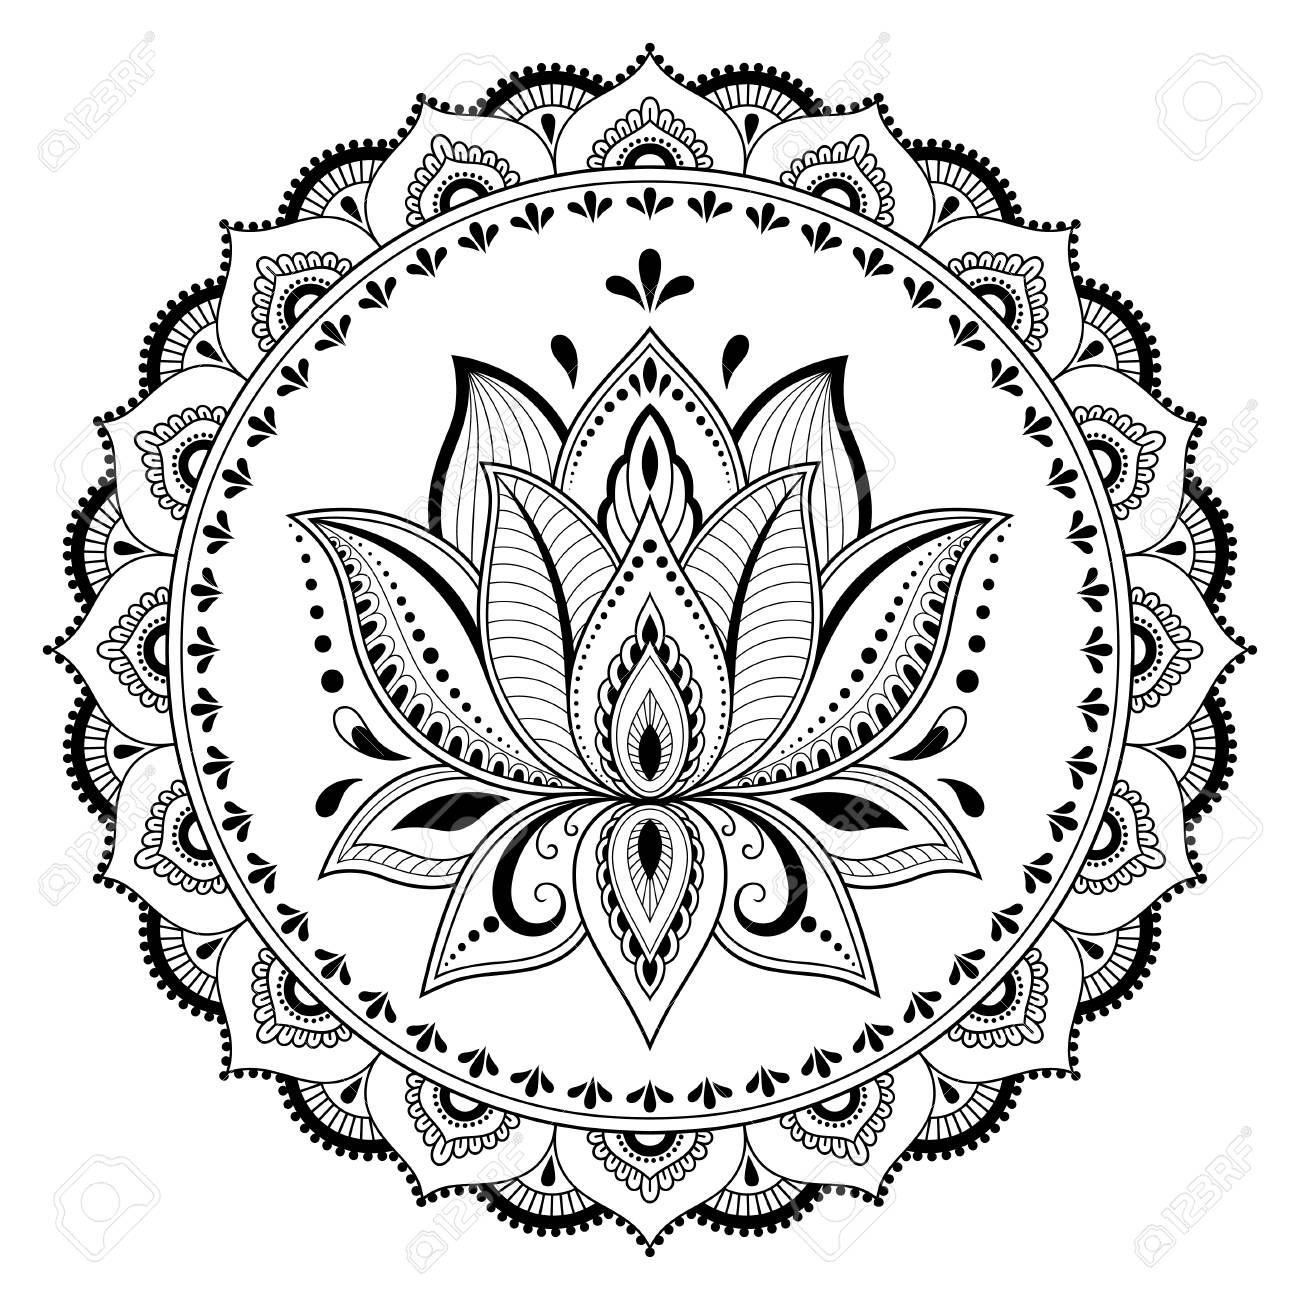 Pin Di Alessia Belle Su Mandala Tatuaggi Fiore Di Loto Tatuaggio Di Fiore Pittura Di Mandala